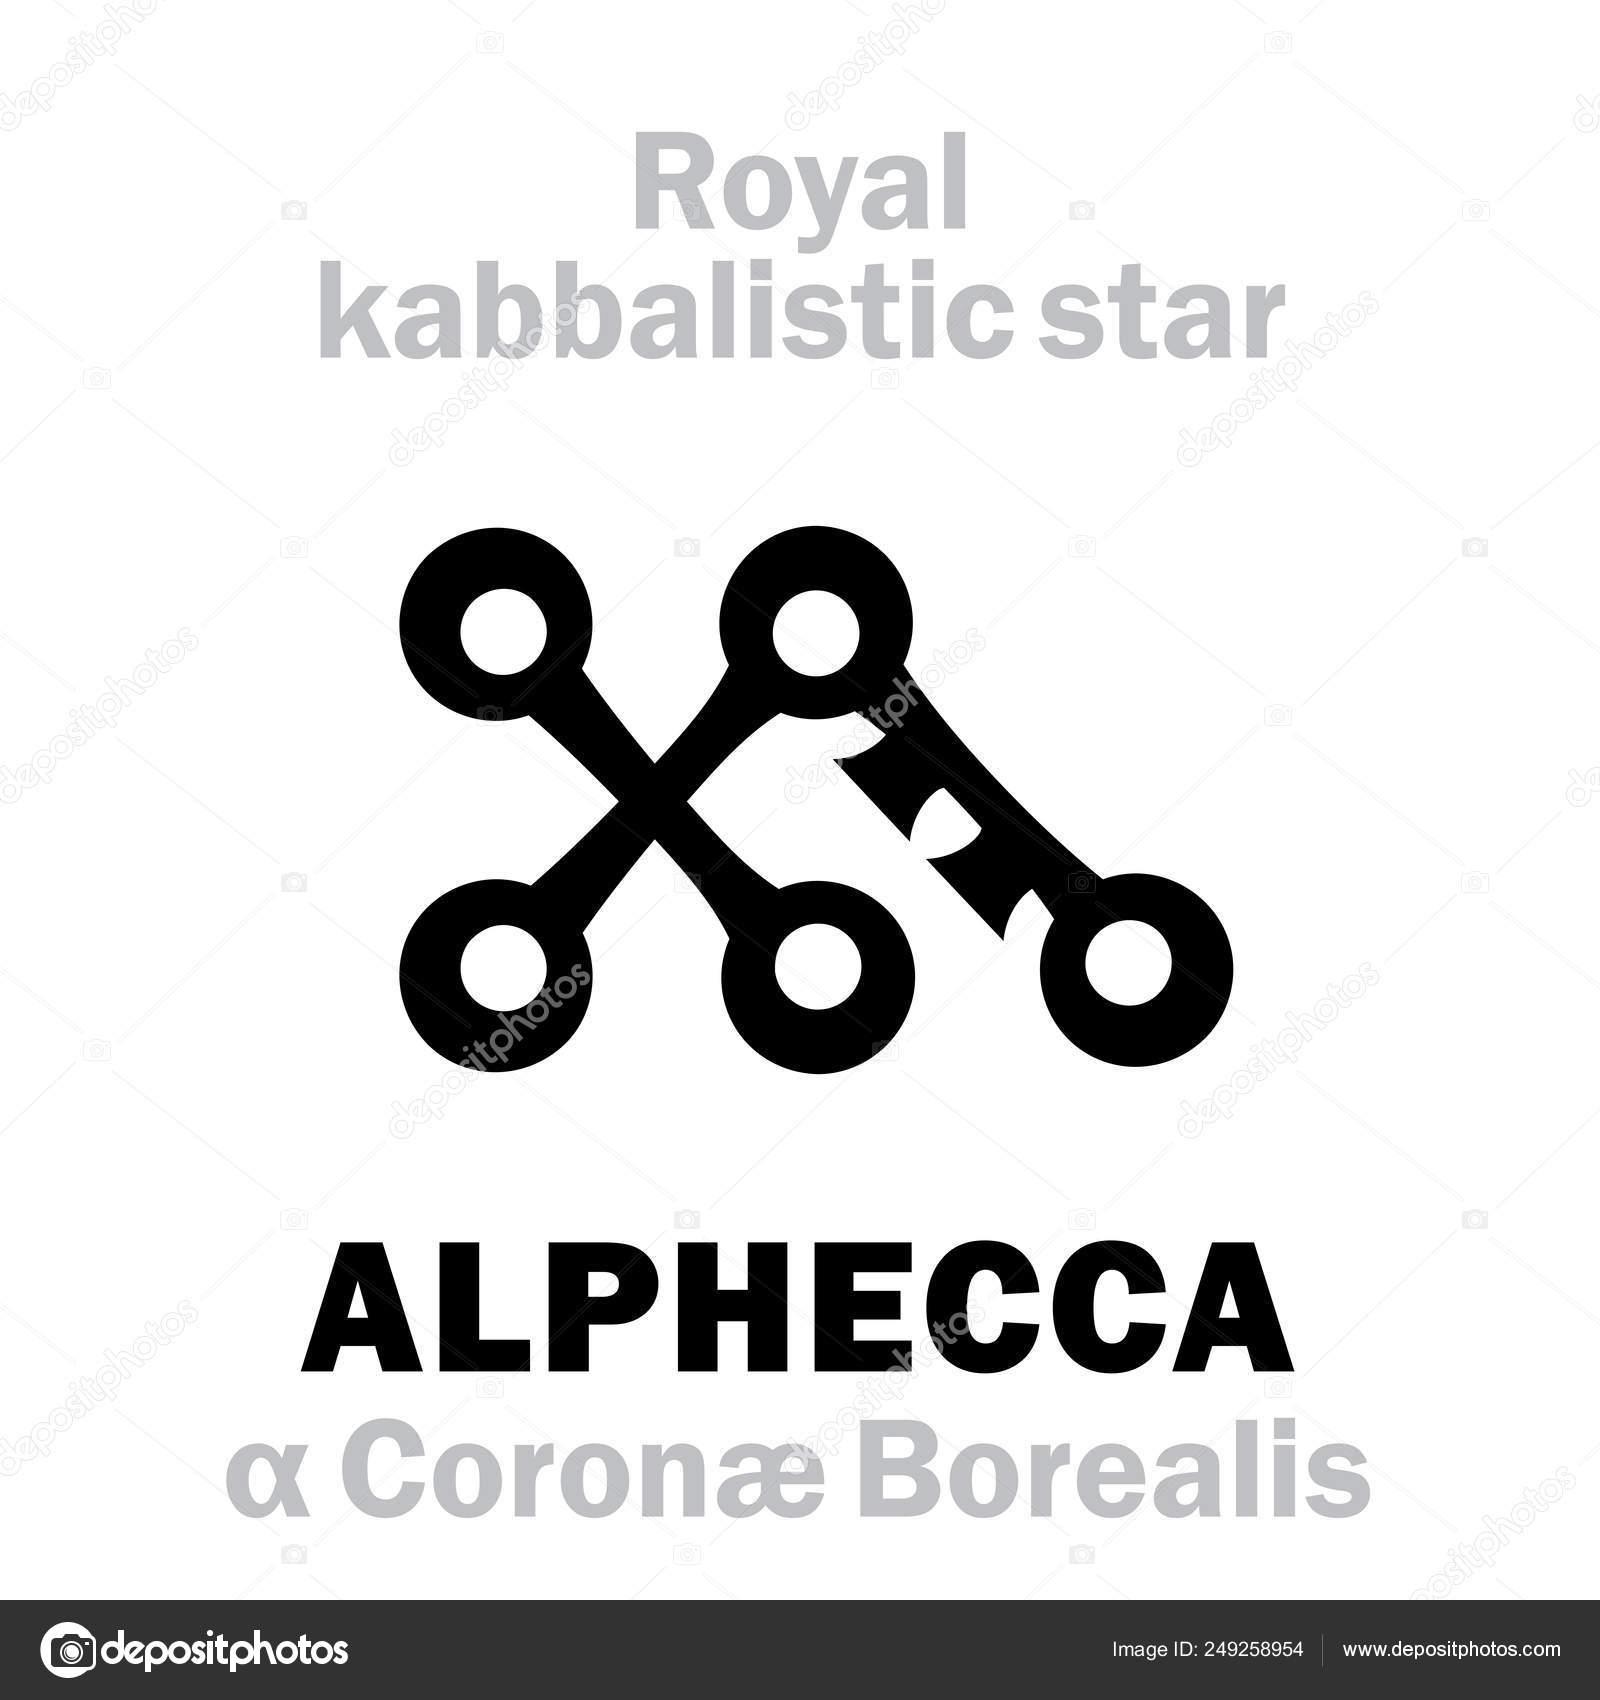 Astrology: ALPHECCA (The Royal Behenian kabbalistic star